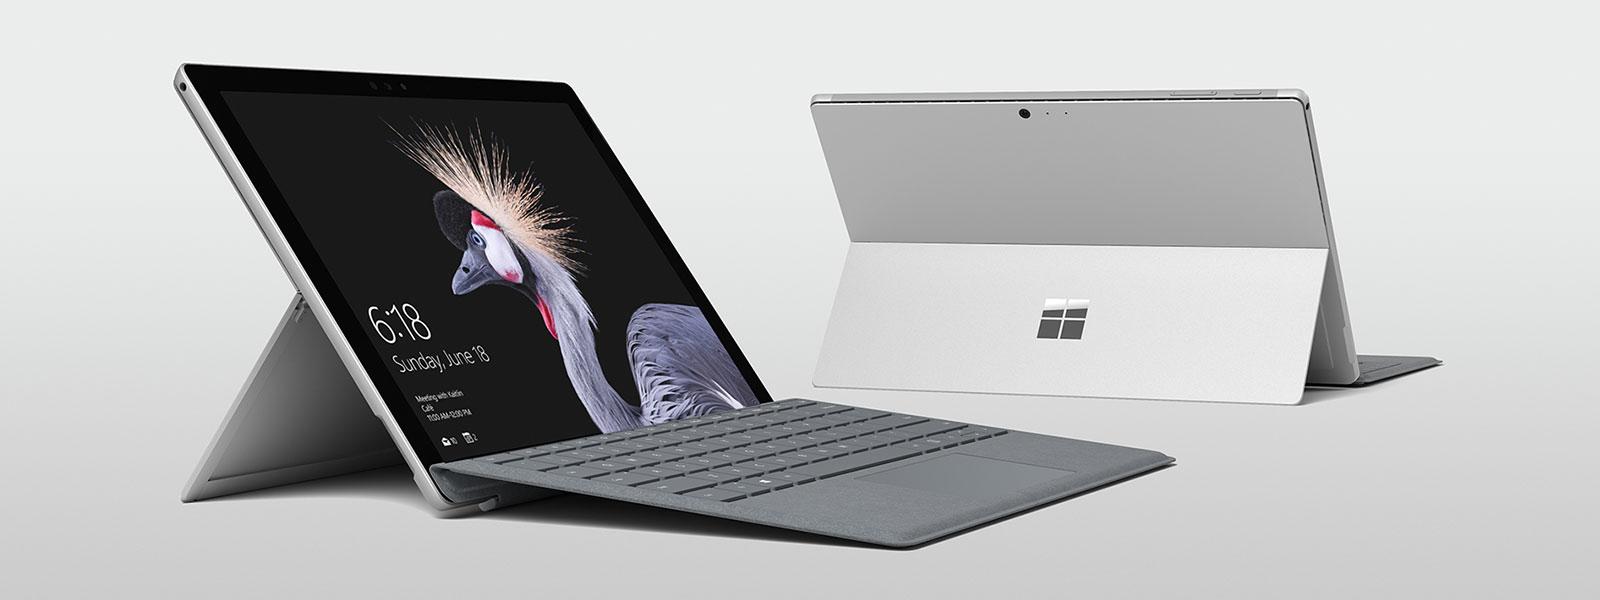 Gruppenproduktbild aller Surface-Geräte